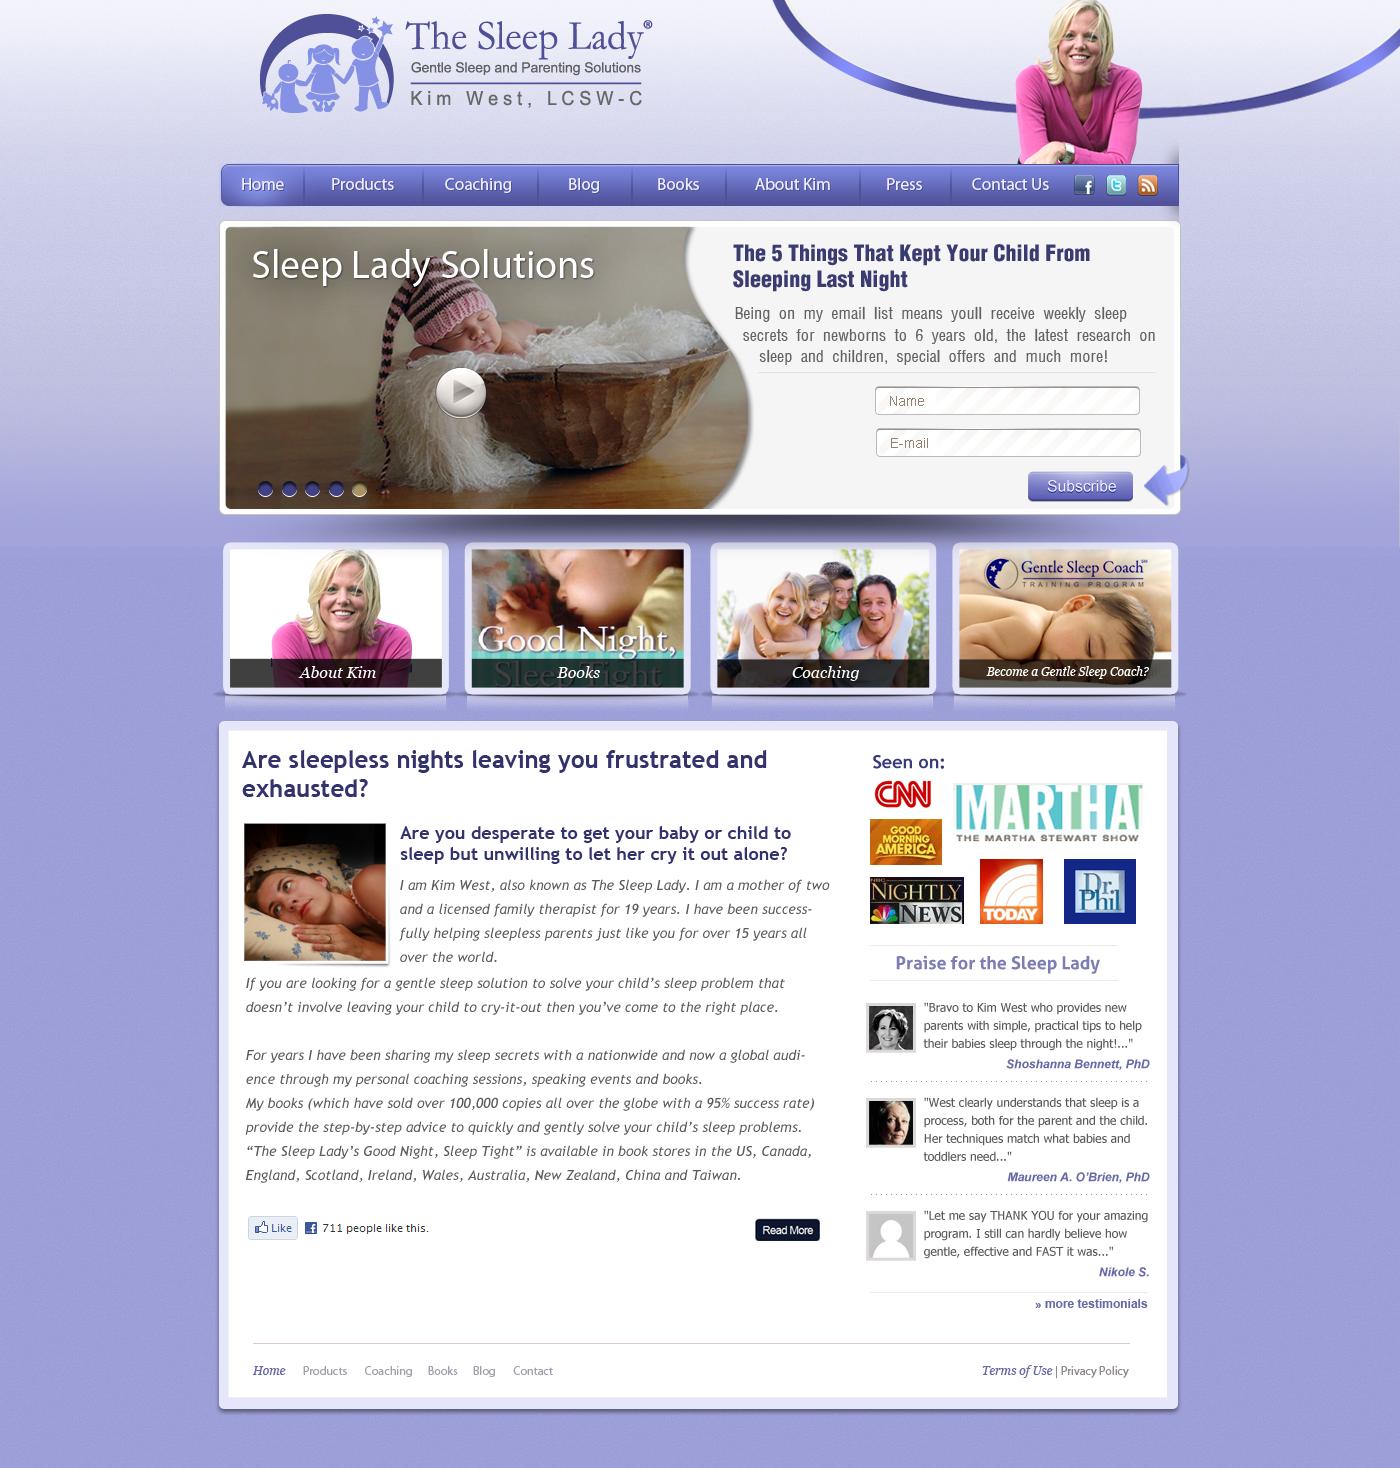 website design for The Sleep Lady